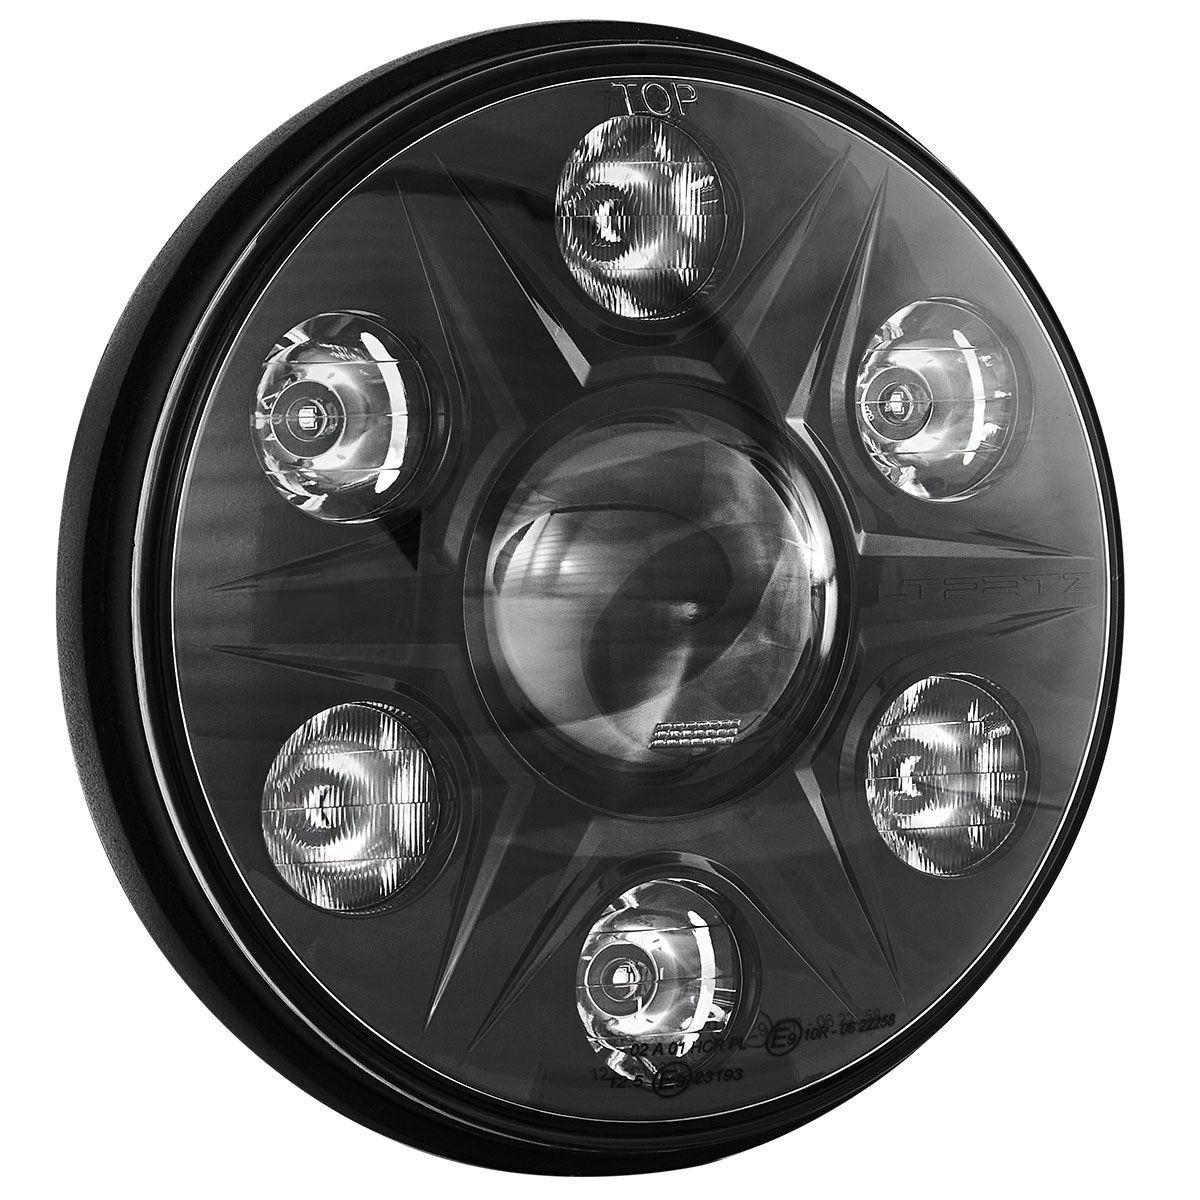 "LTPRTZ 7"" LED Headlights Phantom | RHD Pair"